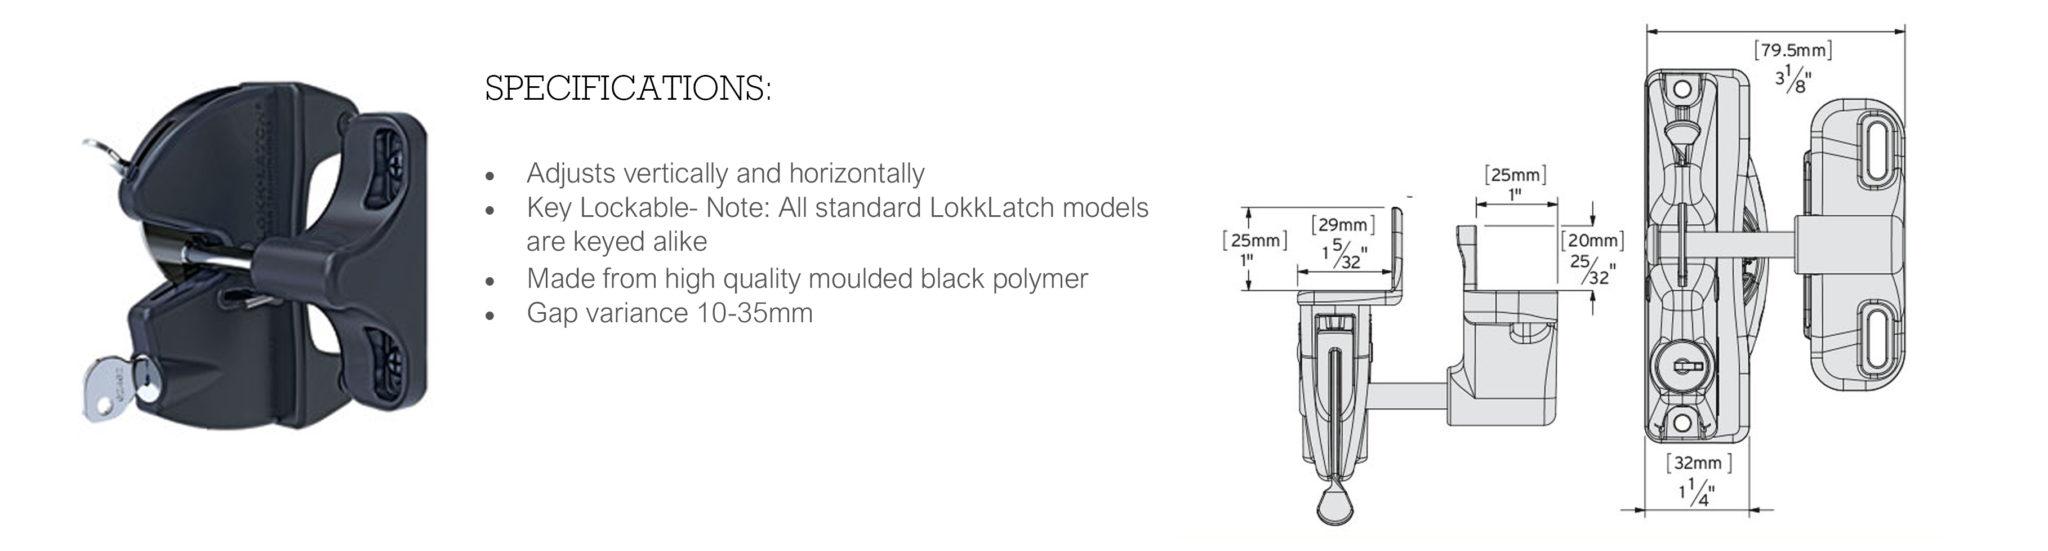 lokklatch-standard-with-specs